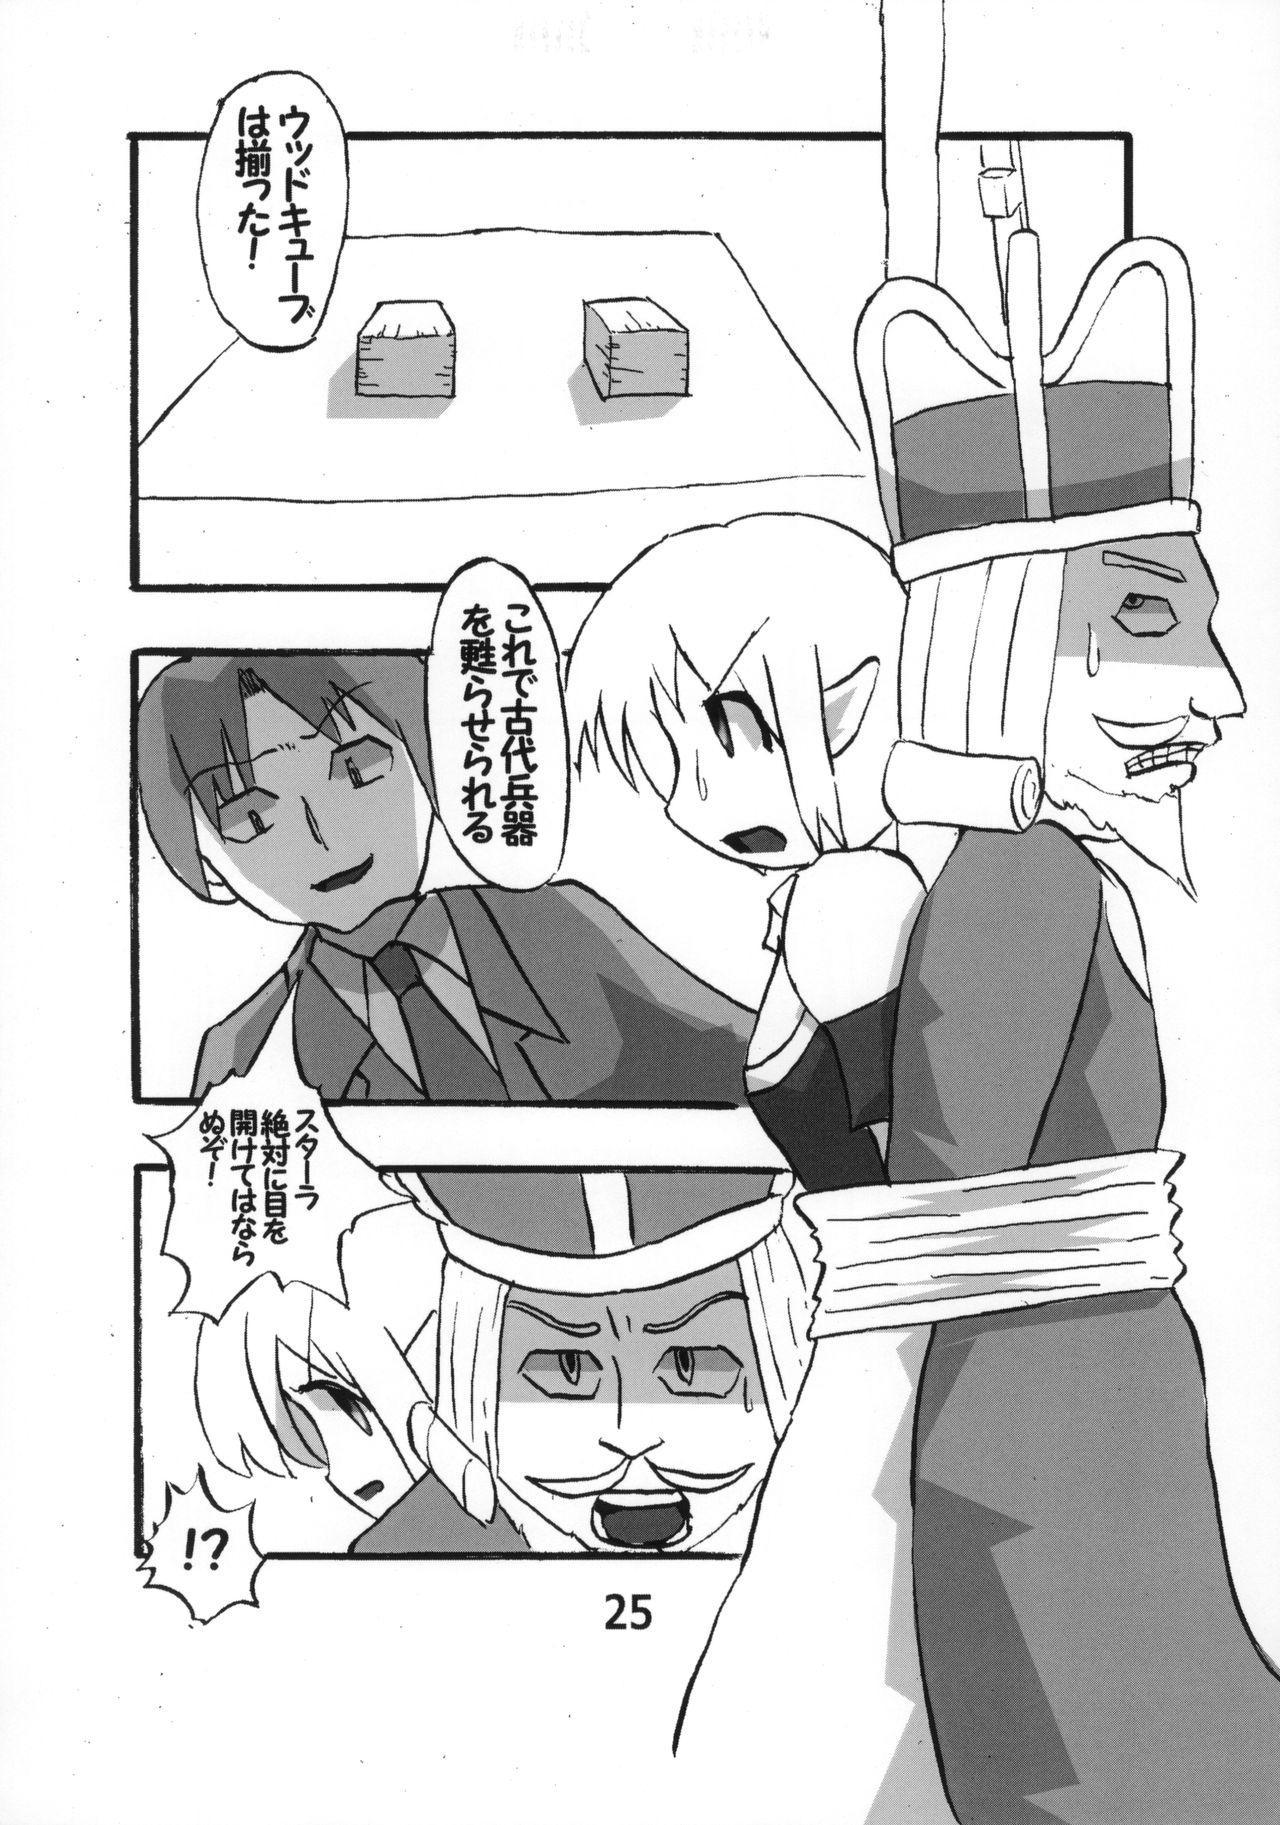 Lucky-jou Pantsu Hunter Vol. 2 23